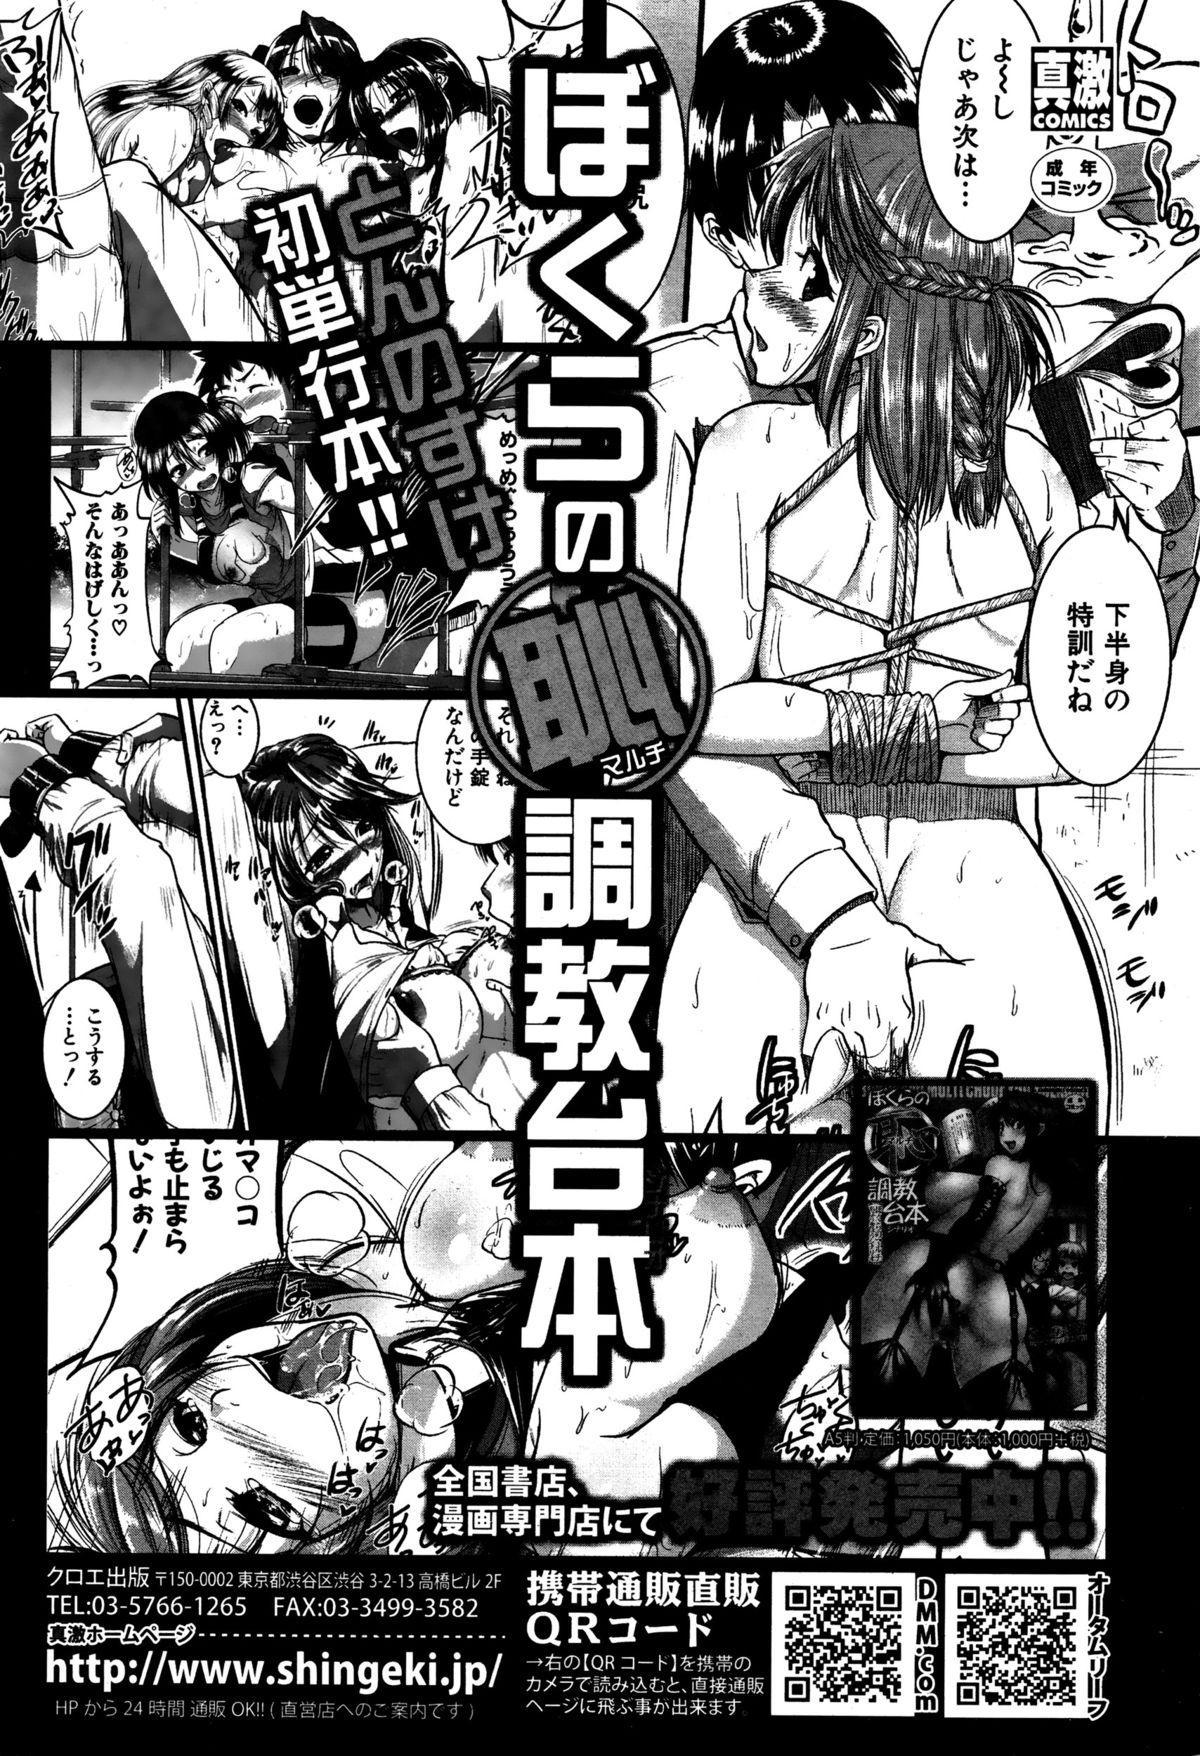 COMIC Shingeki 2016-01 213